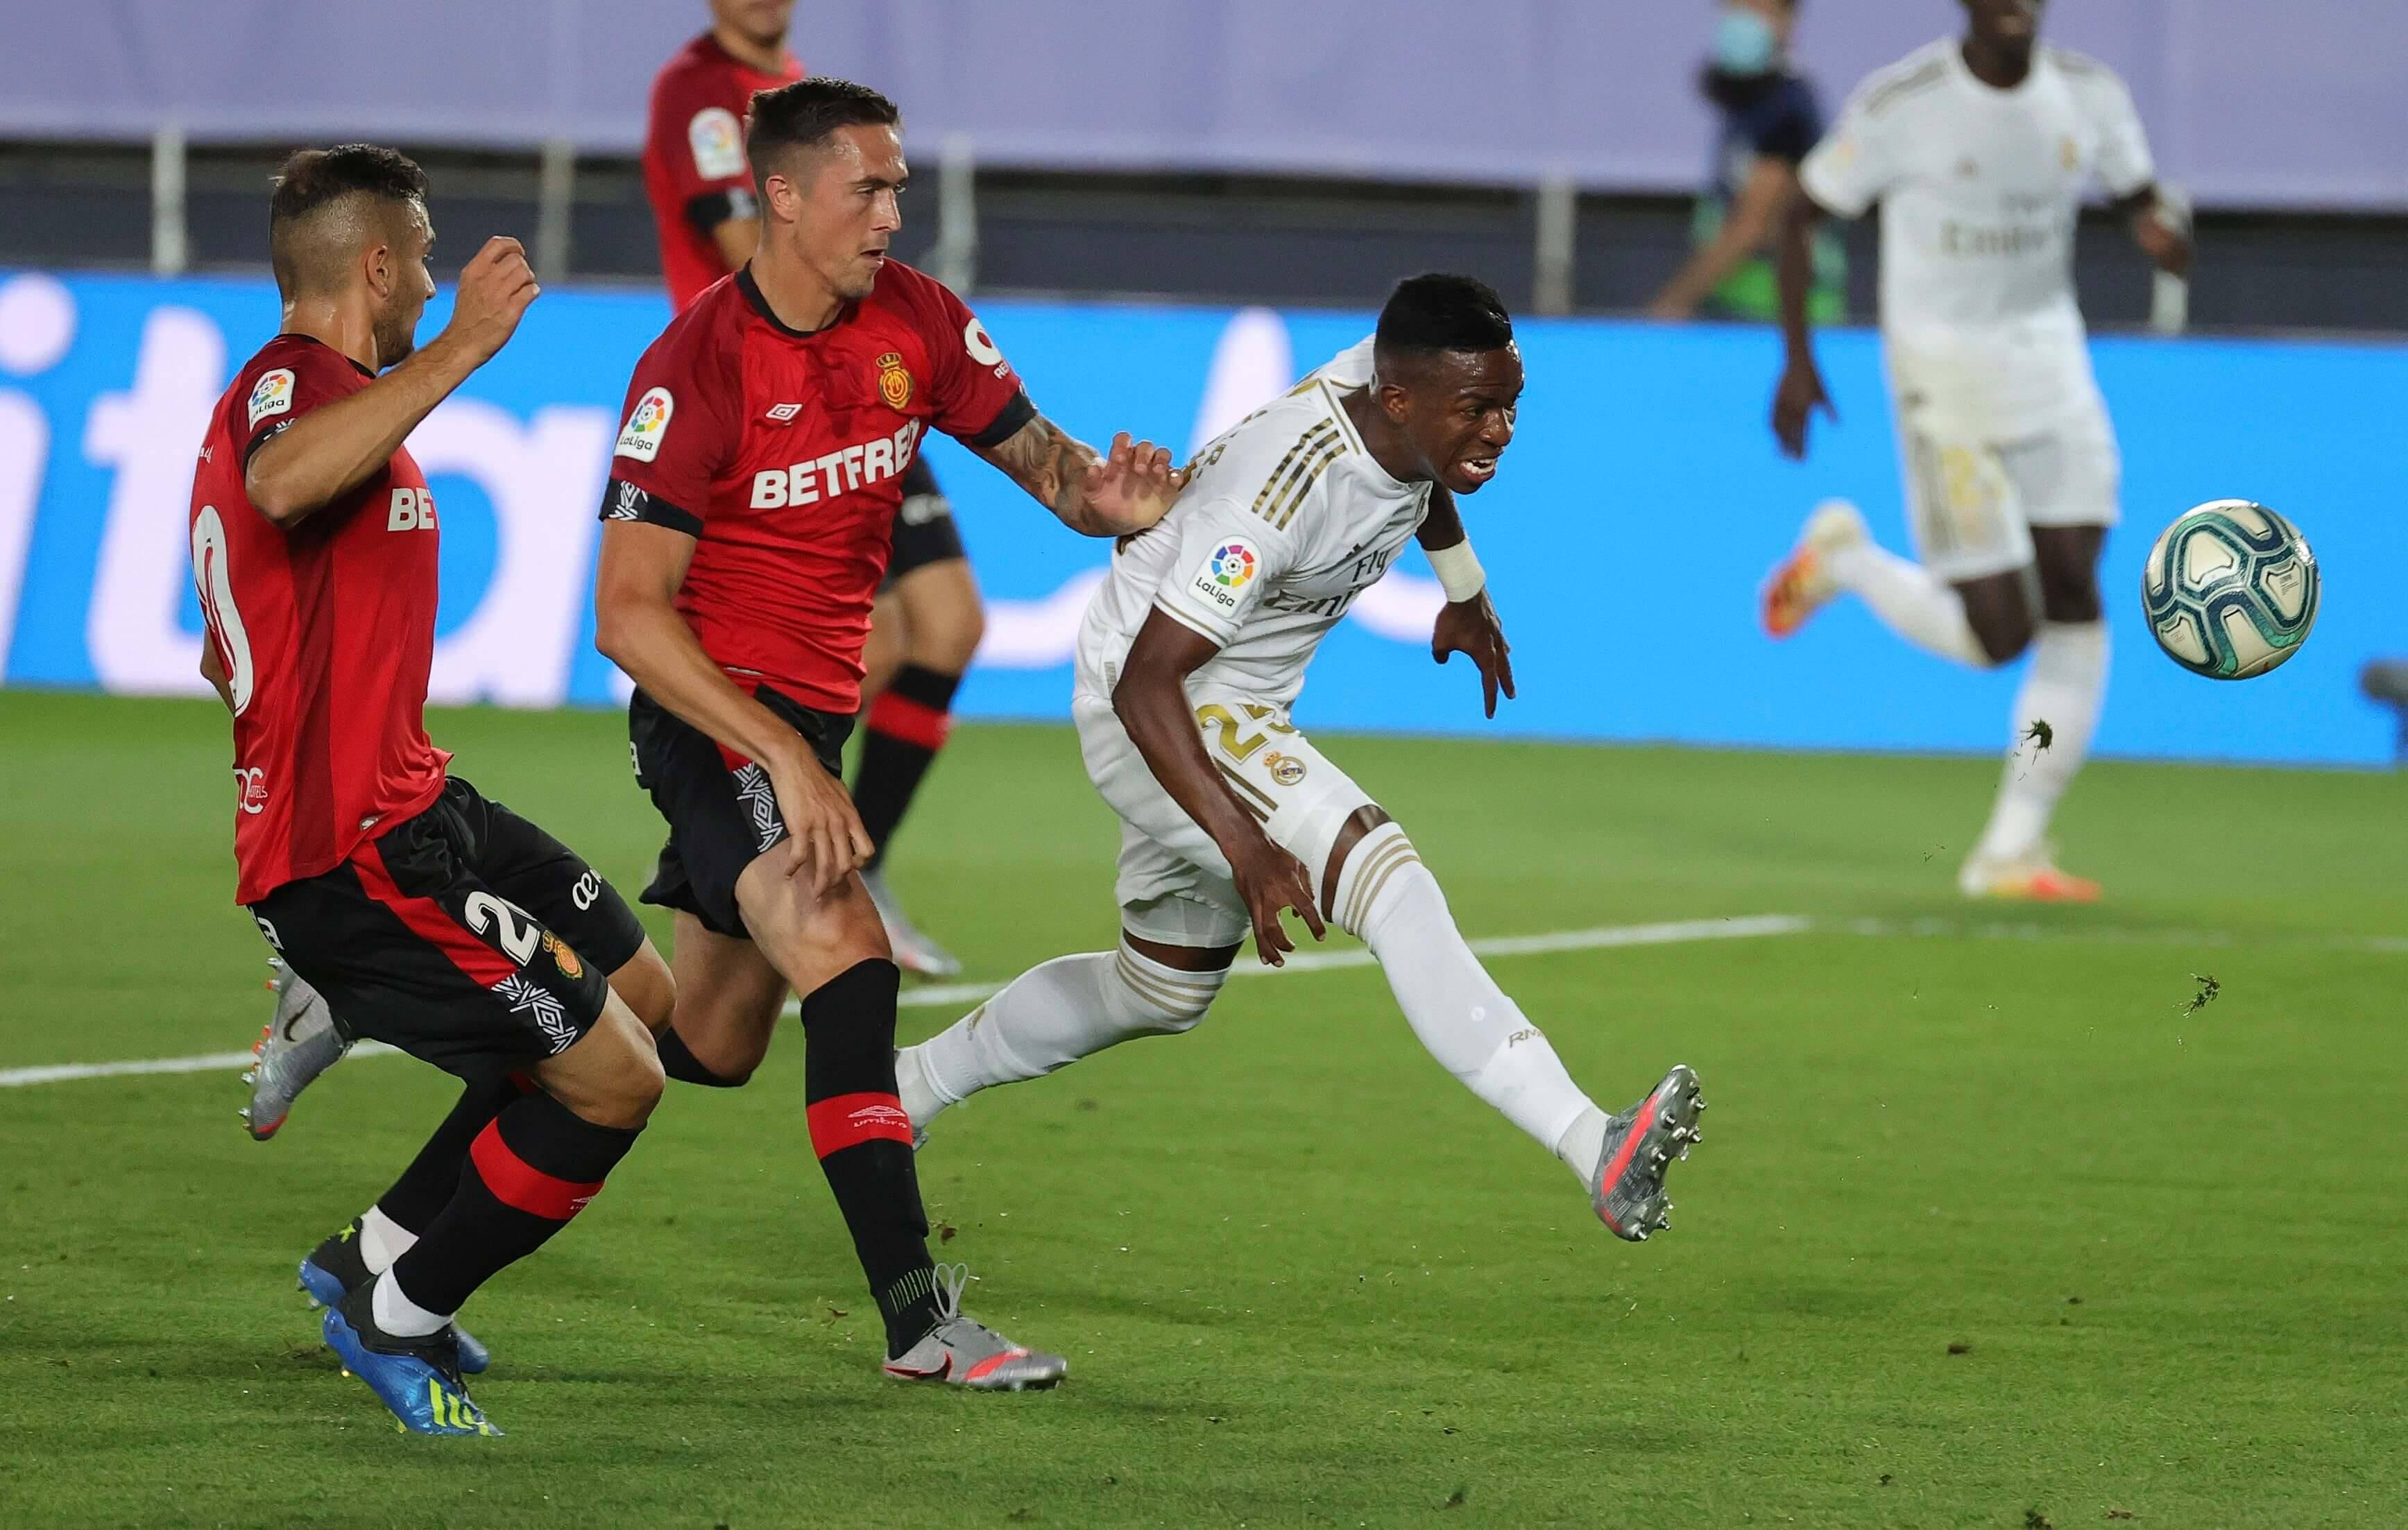 Foto: Reprodução/Twitter La Liga